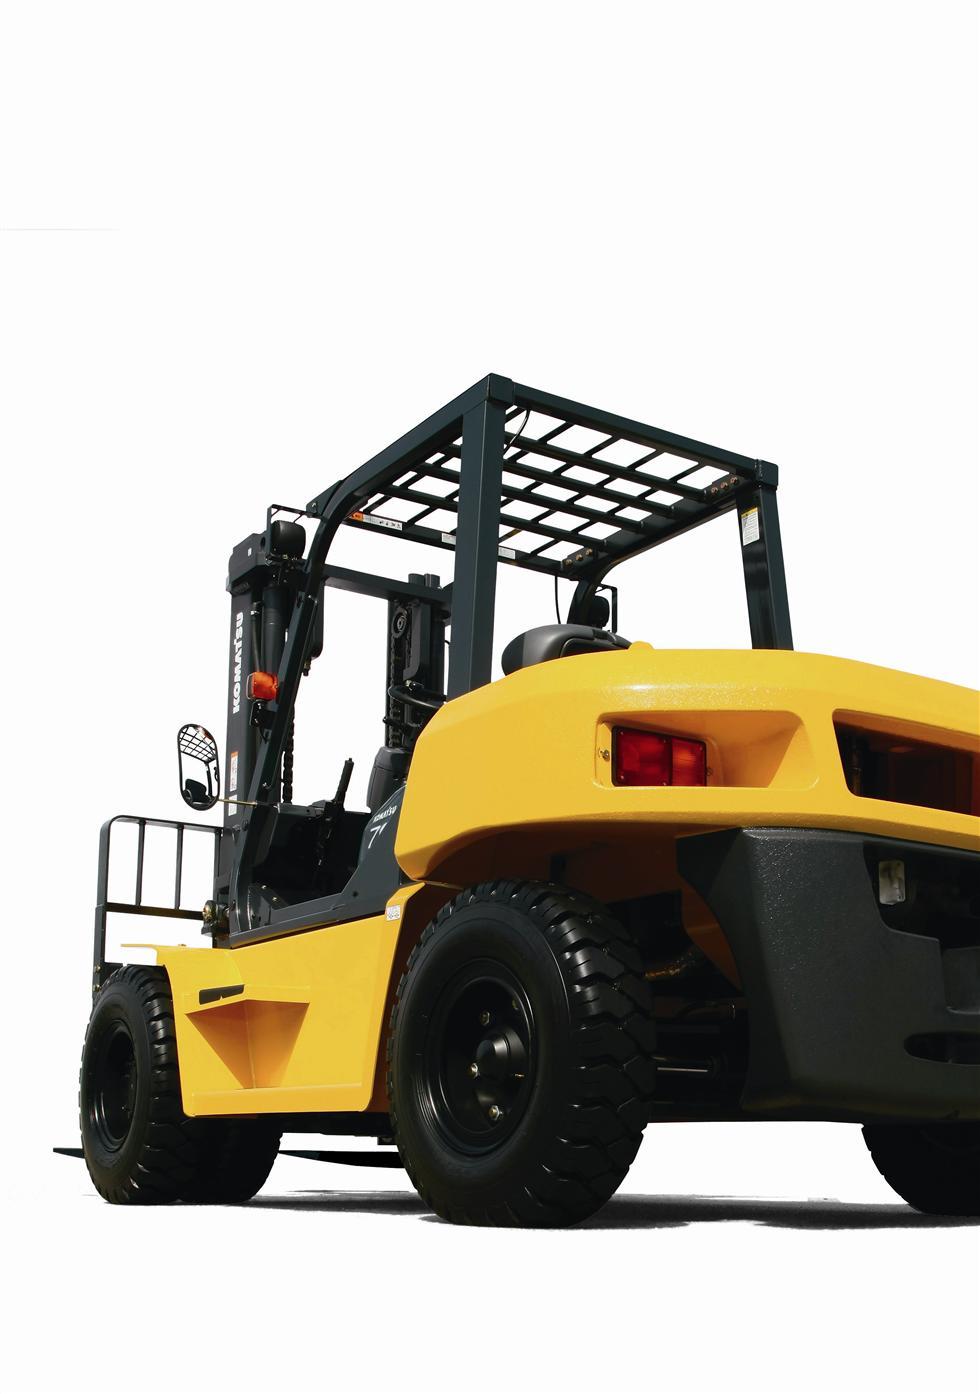 Diesel Pneumatic Forklift